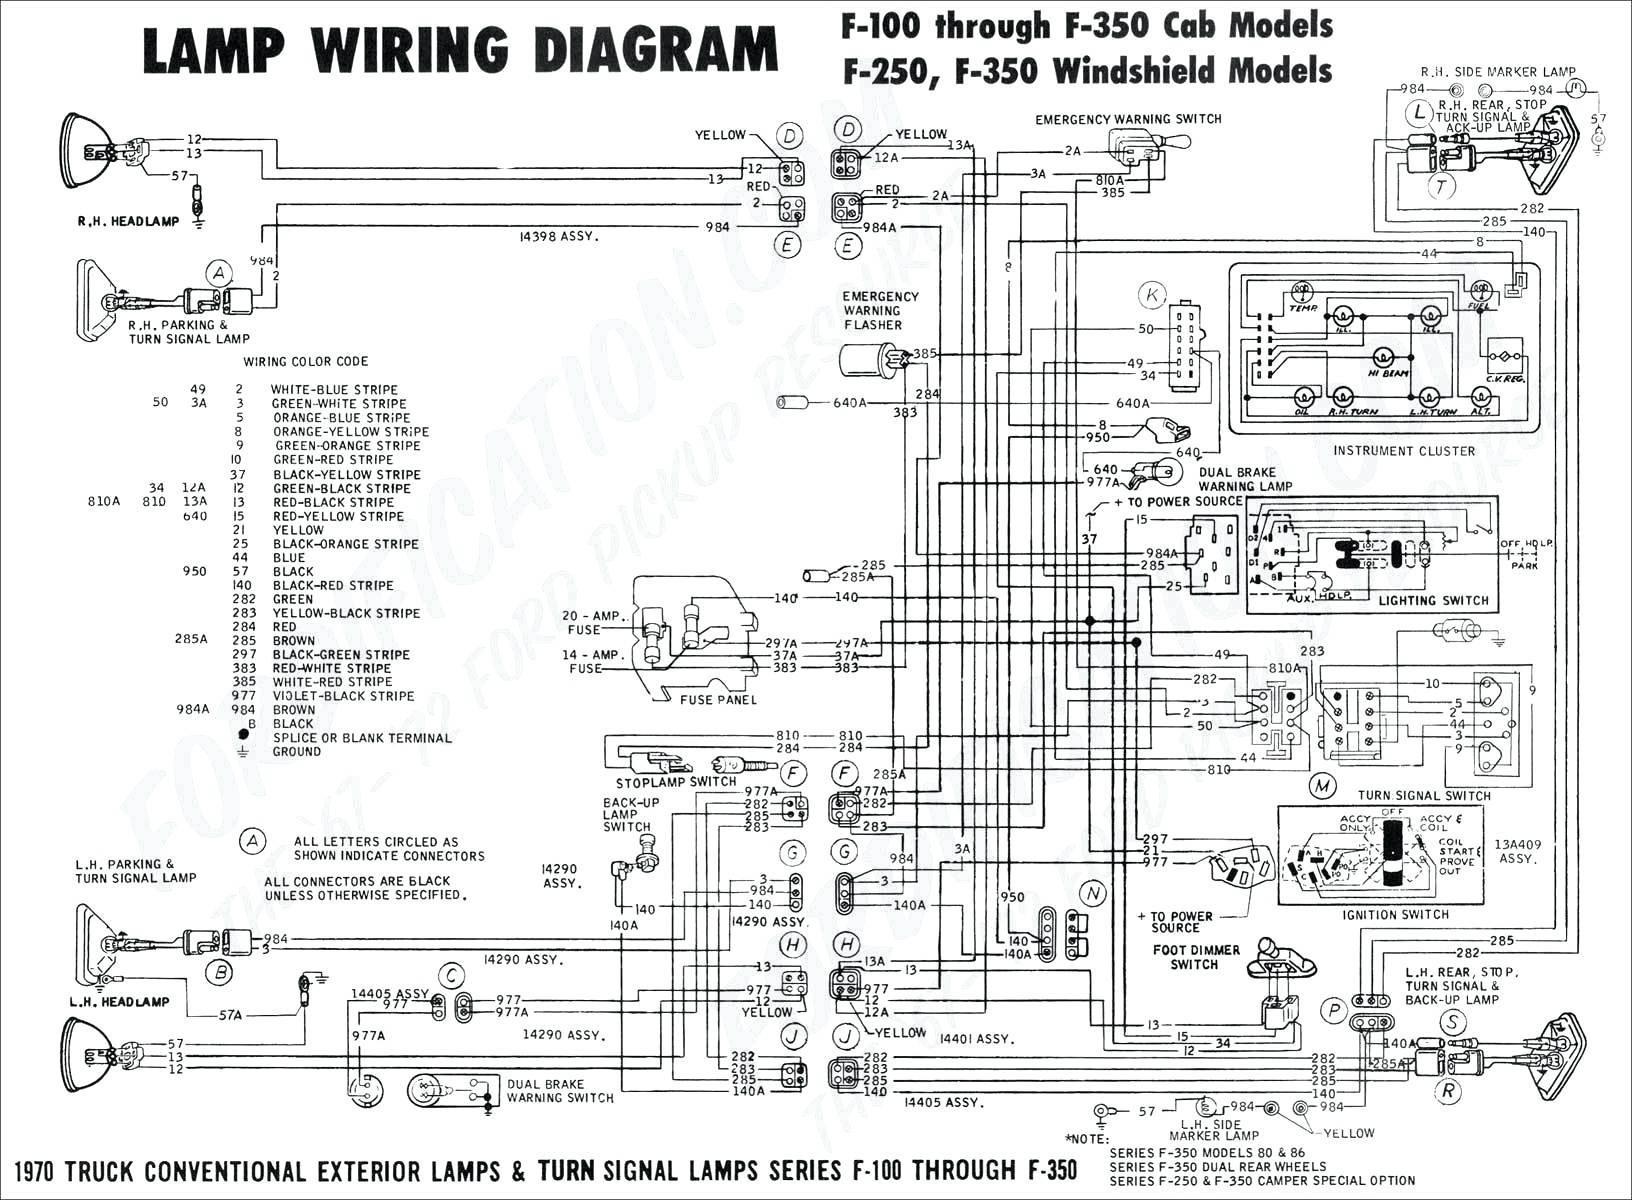 Best Of 7 Way Trailer Plug Wiring Diagram Chevy